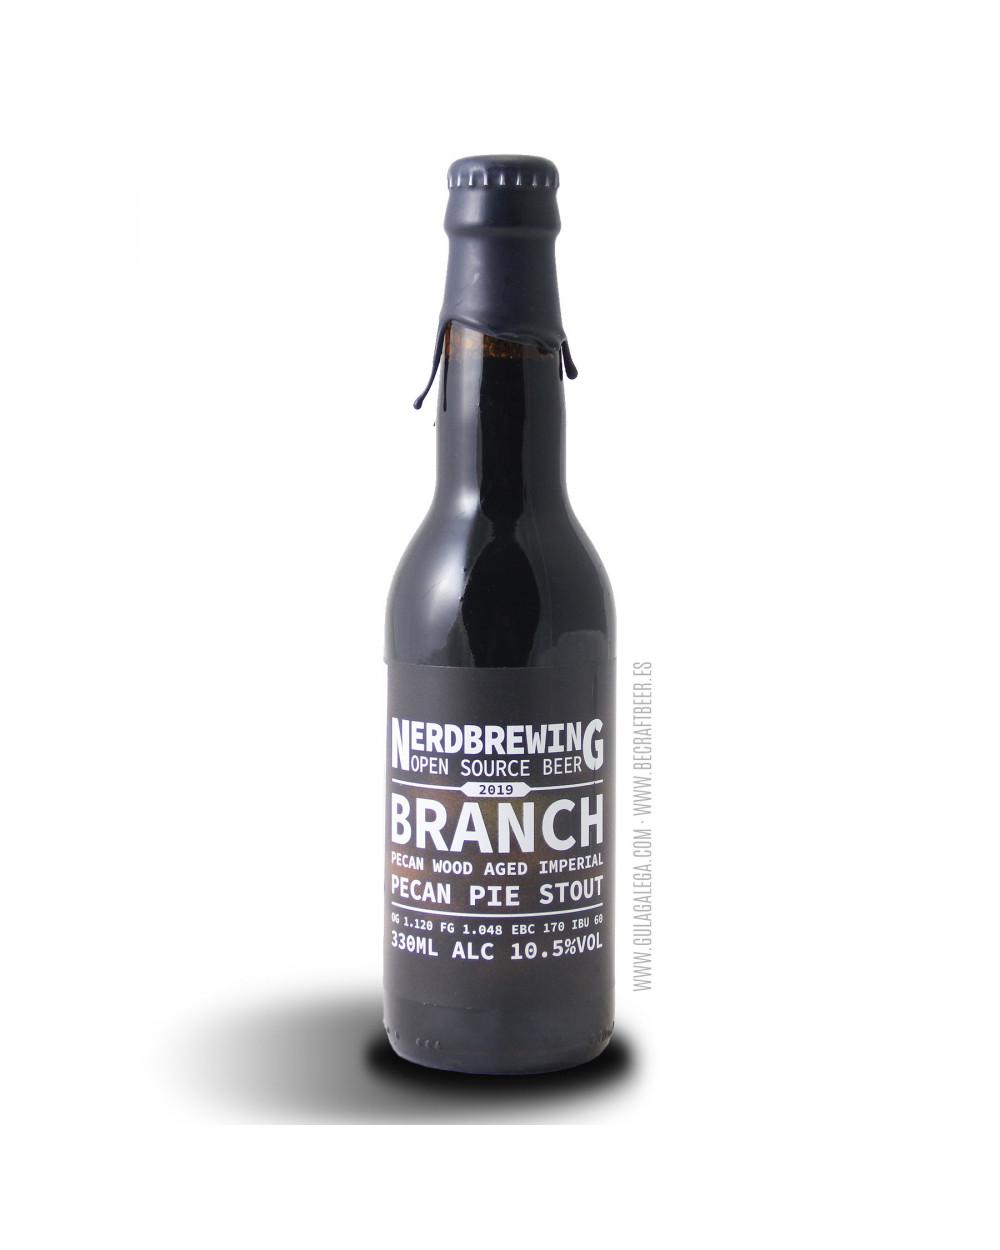 Cerveza Artesana NERDBREWING Branch Pecan Pie Stout 33 cl.